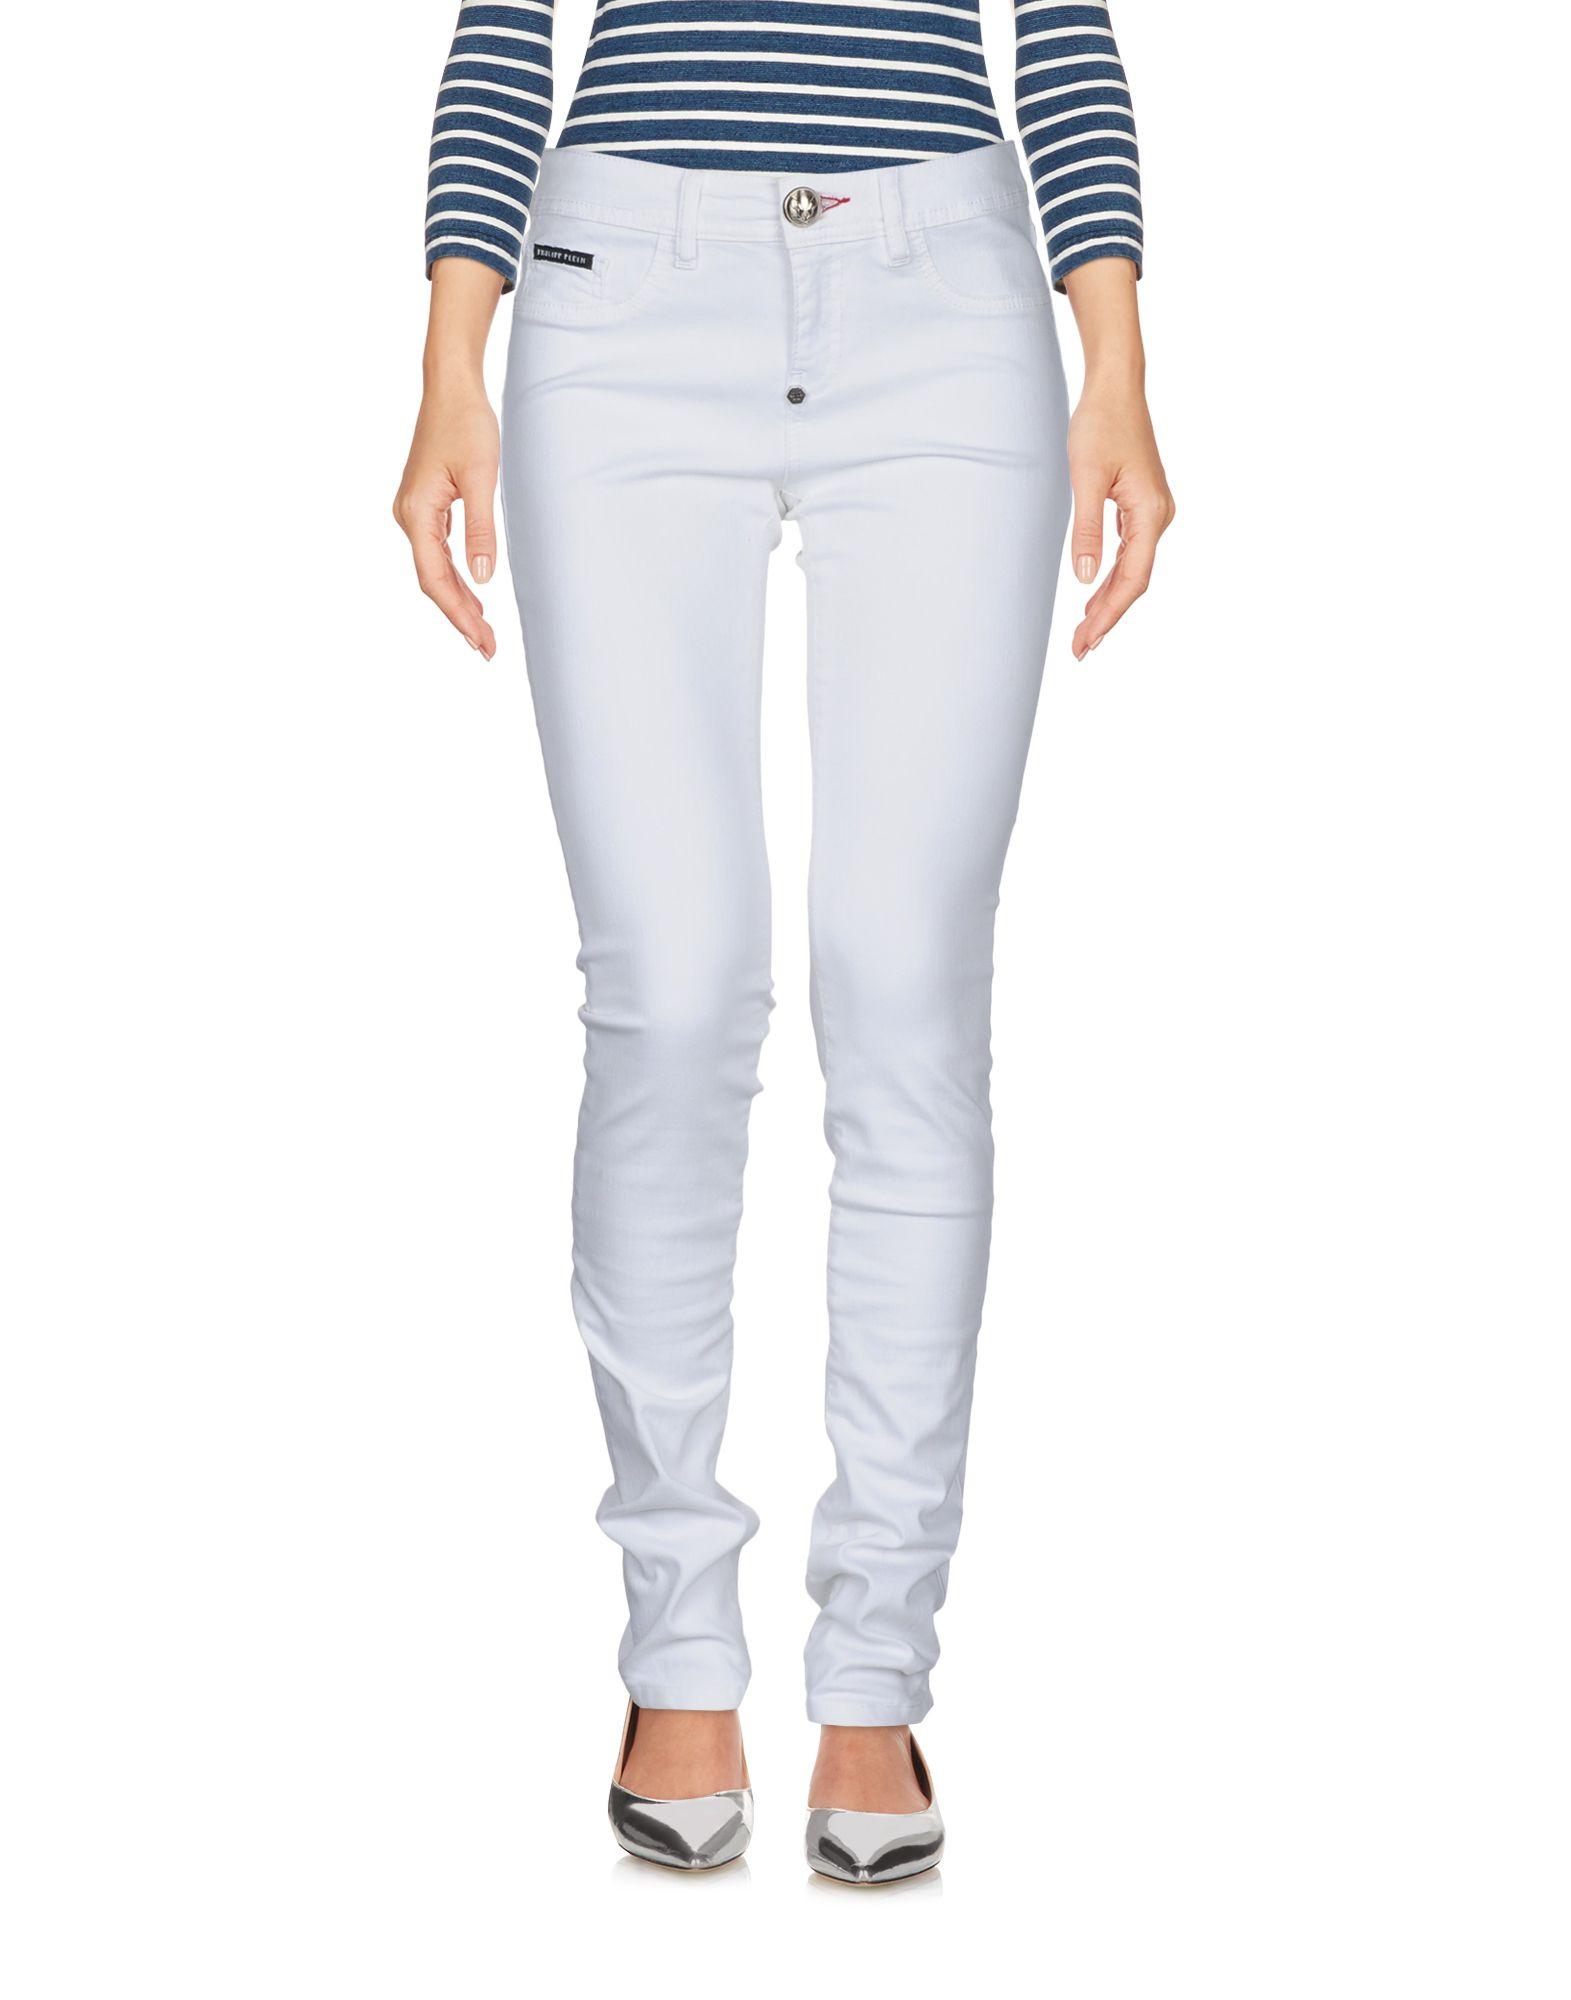 Pantaloni Jeans Philipp Plein Donna - Acquista online su 7xNmXwo